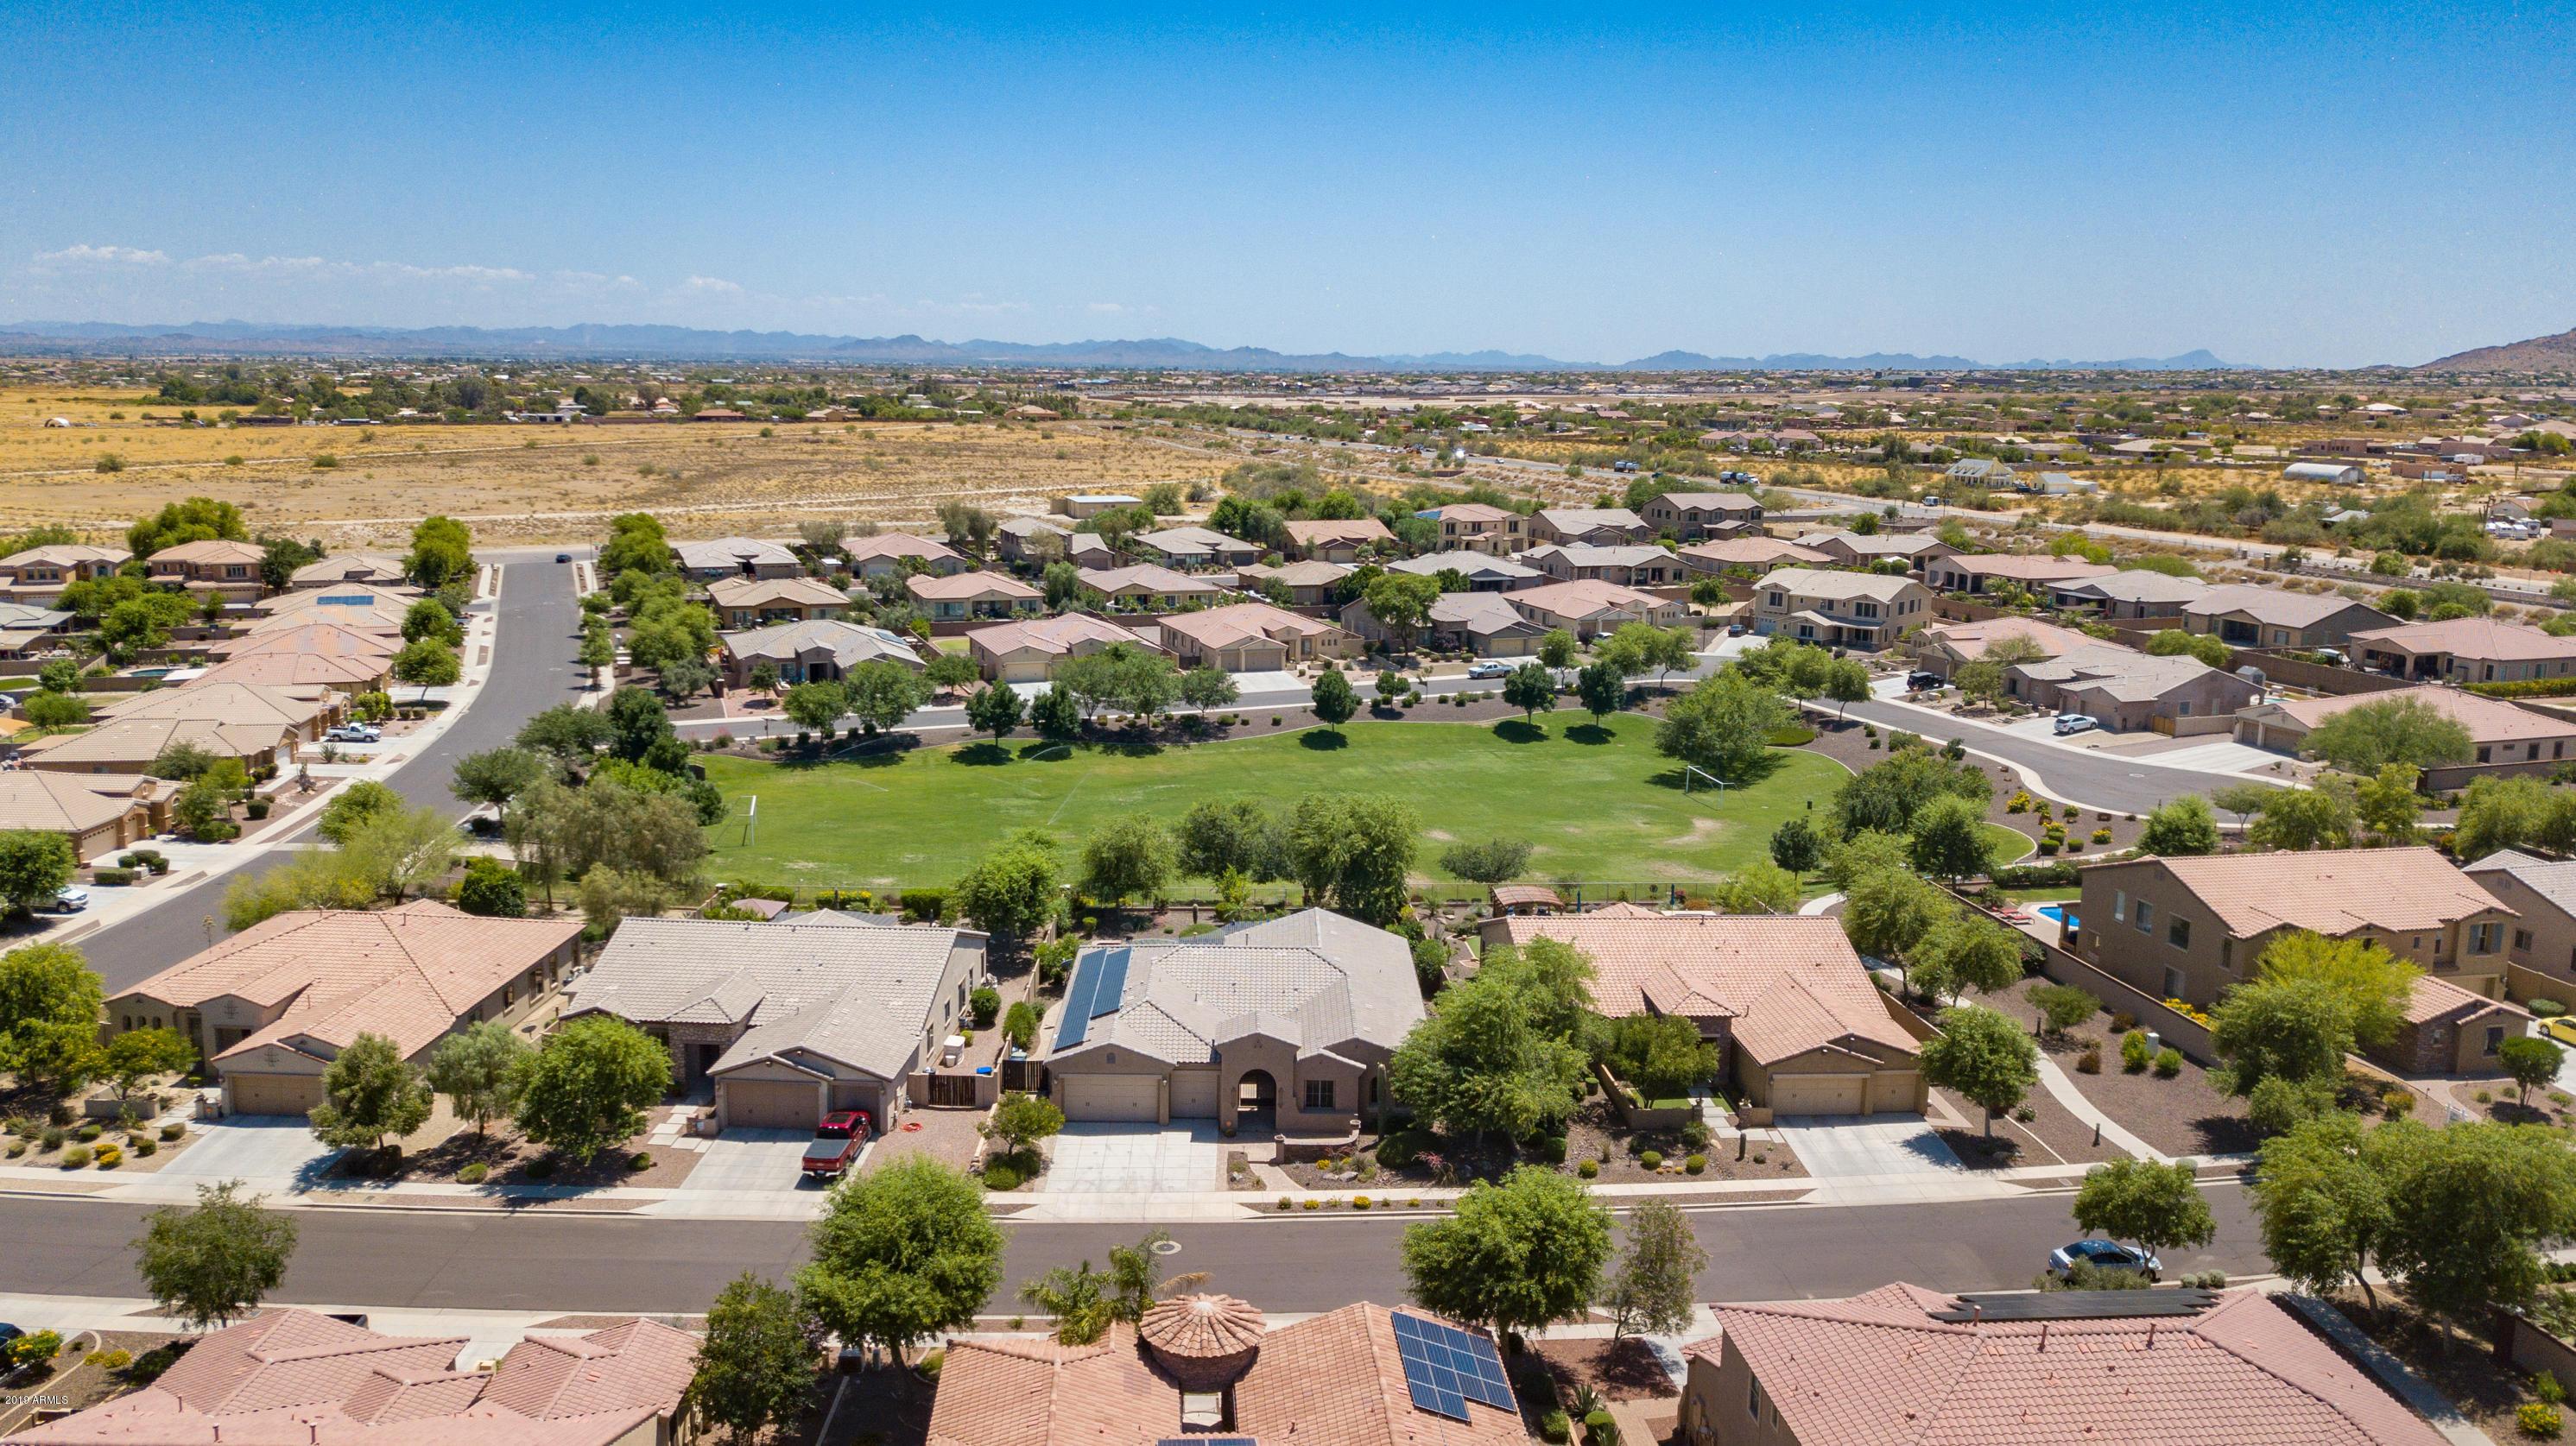 MLS 5939353 19339 W MEDLOCK Drive, Litchfield Park, AZ 85340 Litchfield Park AZ Arroyo Mountain Estates